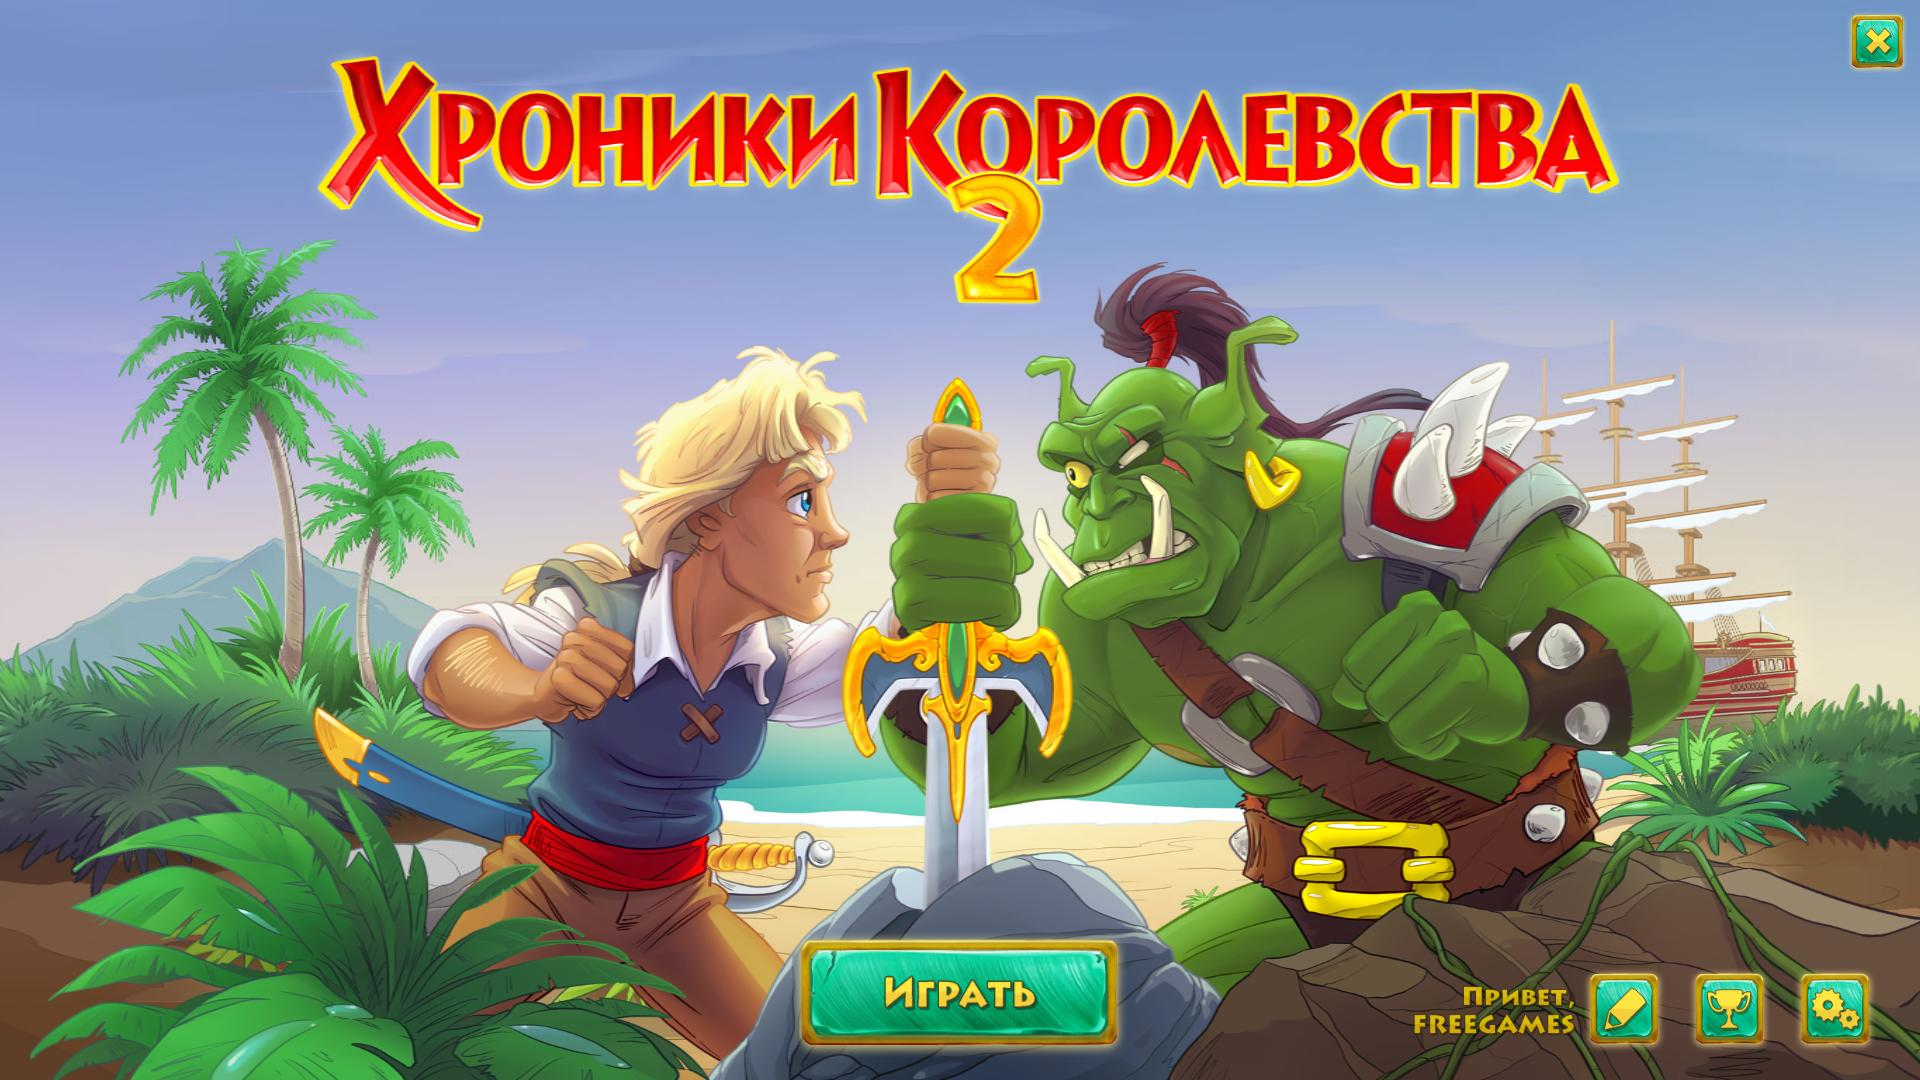 Хроники Королевства 2 | Kingdom Chronicles 2 (Rus)